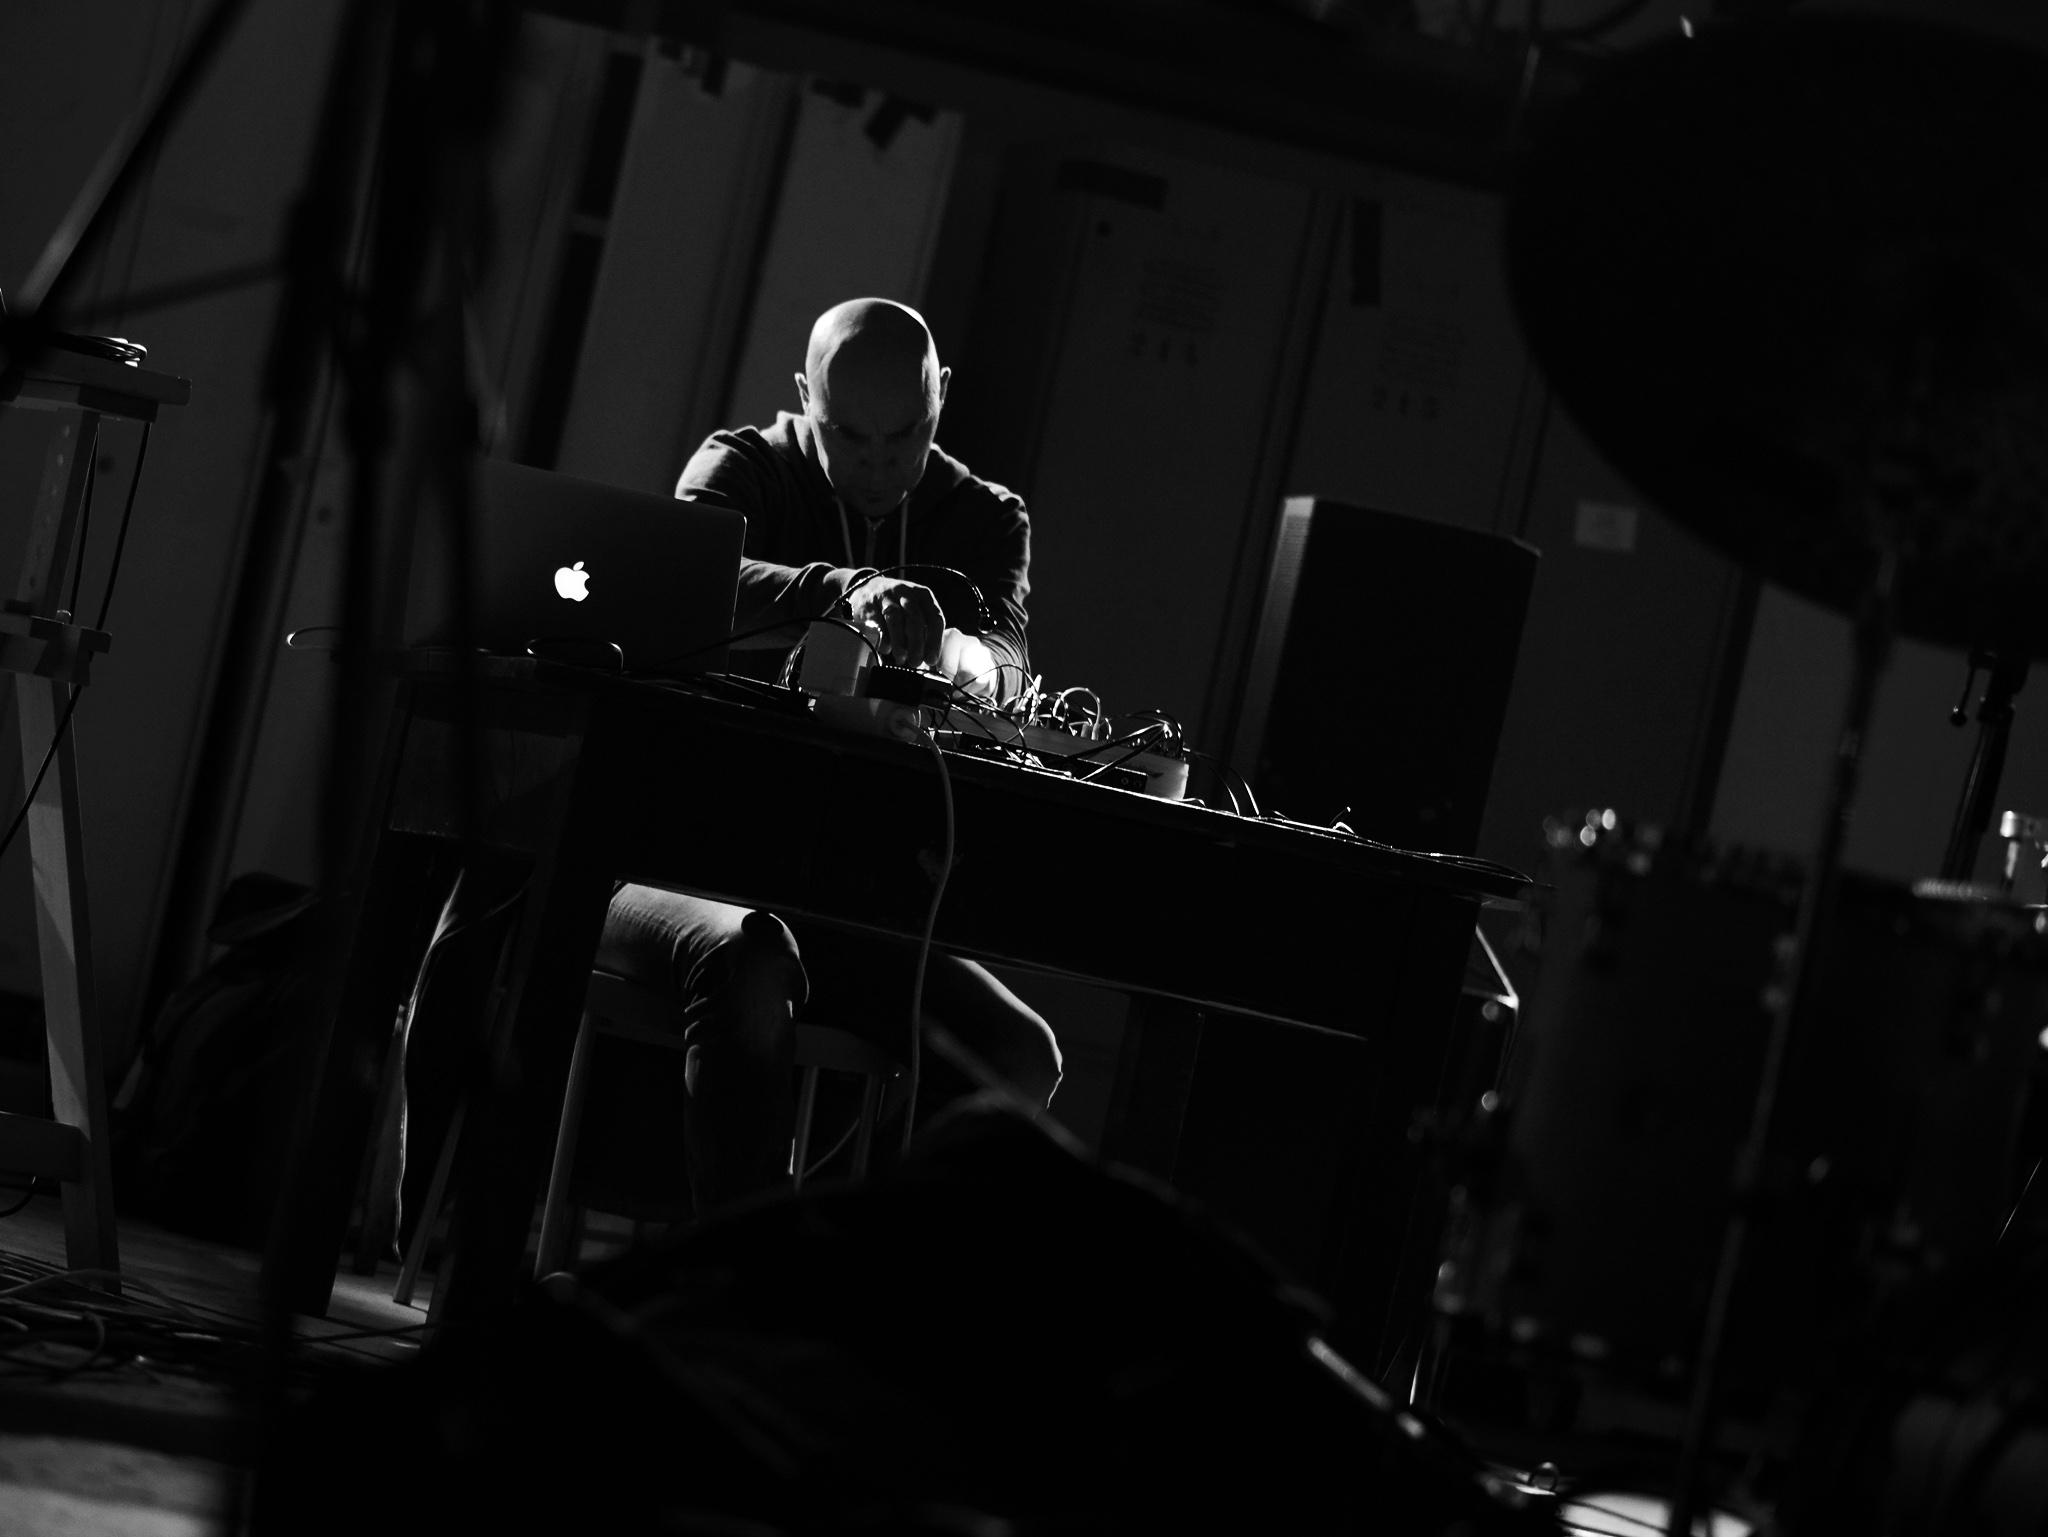 Solo Concert @ Moozak 10th anniversary event, Vienna